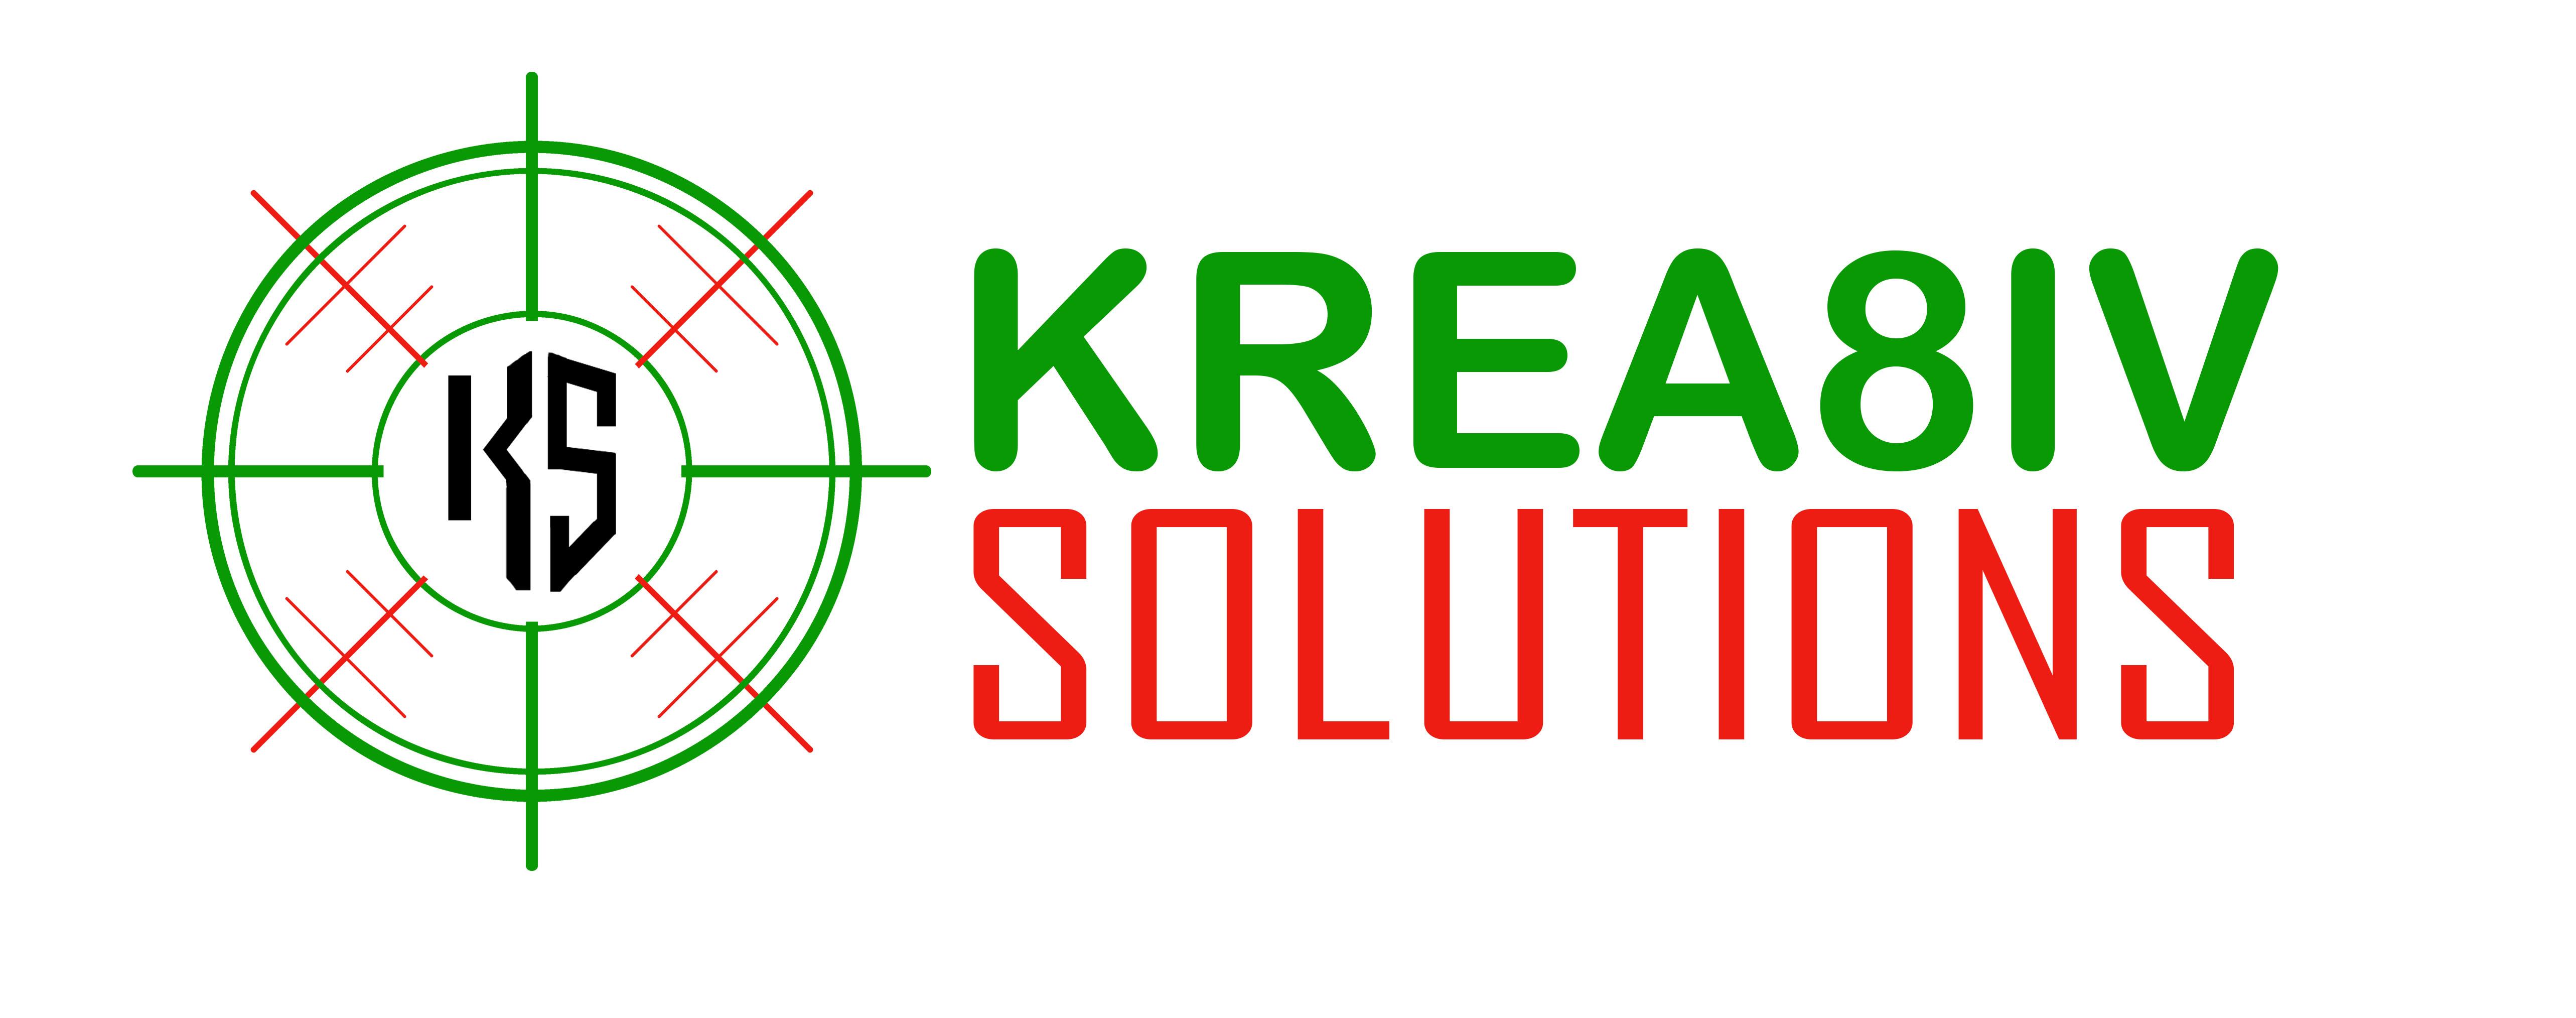 Krea8iv Solutions